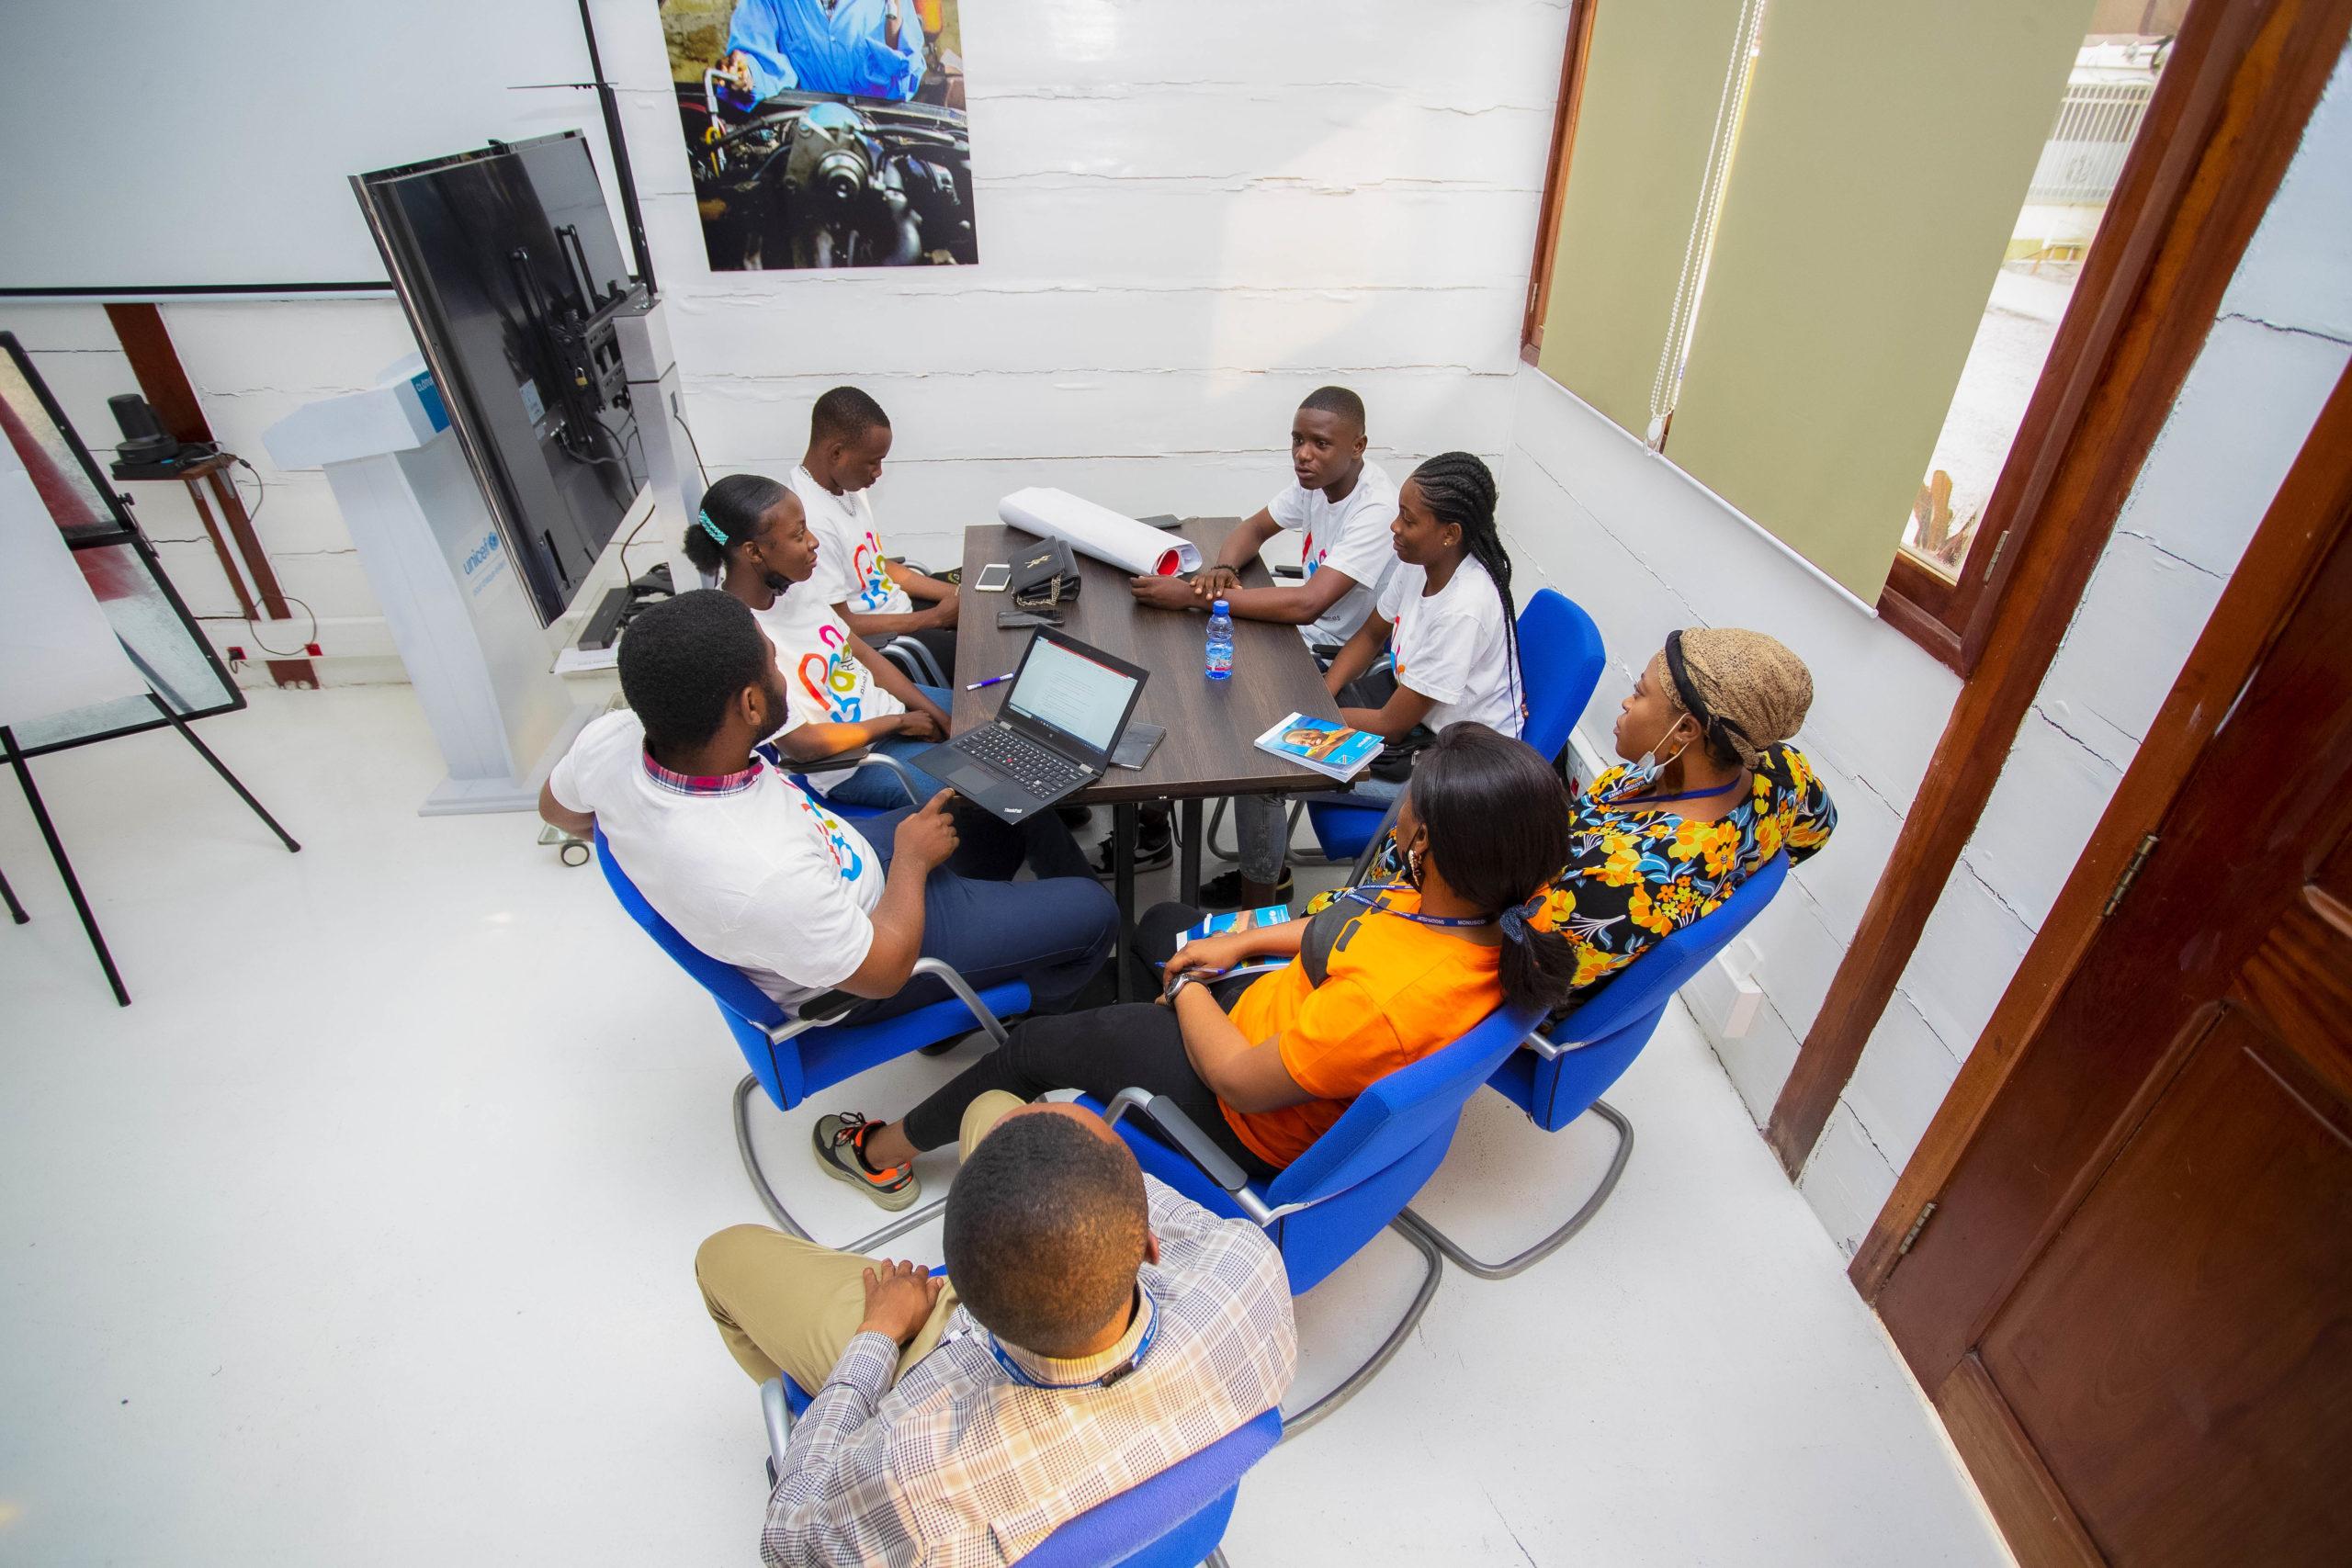 Rencontre entre enfants, jeunes reporters et les journalistes de la radio Okapi enfant à UNICEF RDC, Kinshasa 2021 Josué Mulala